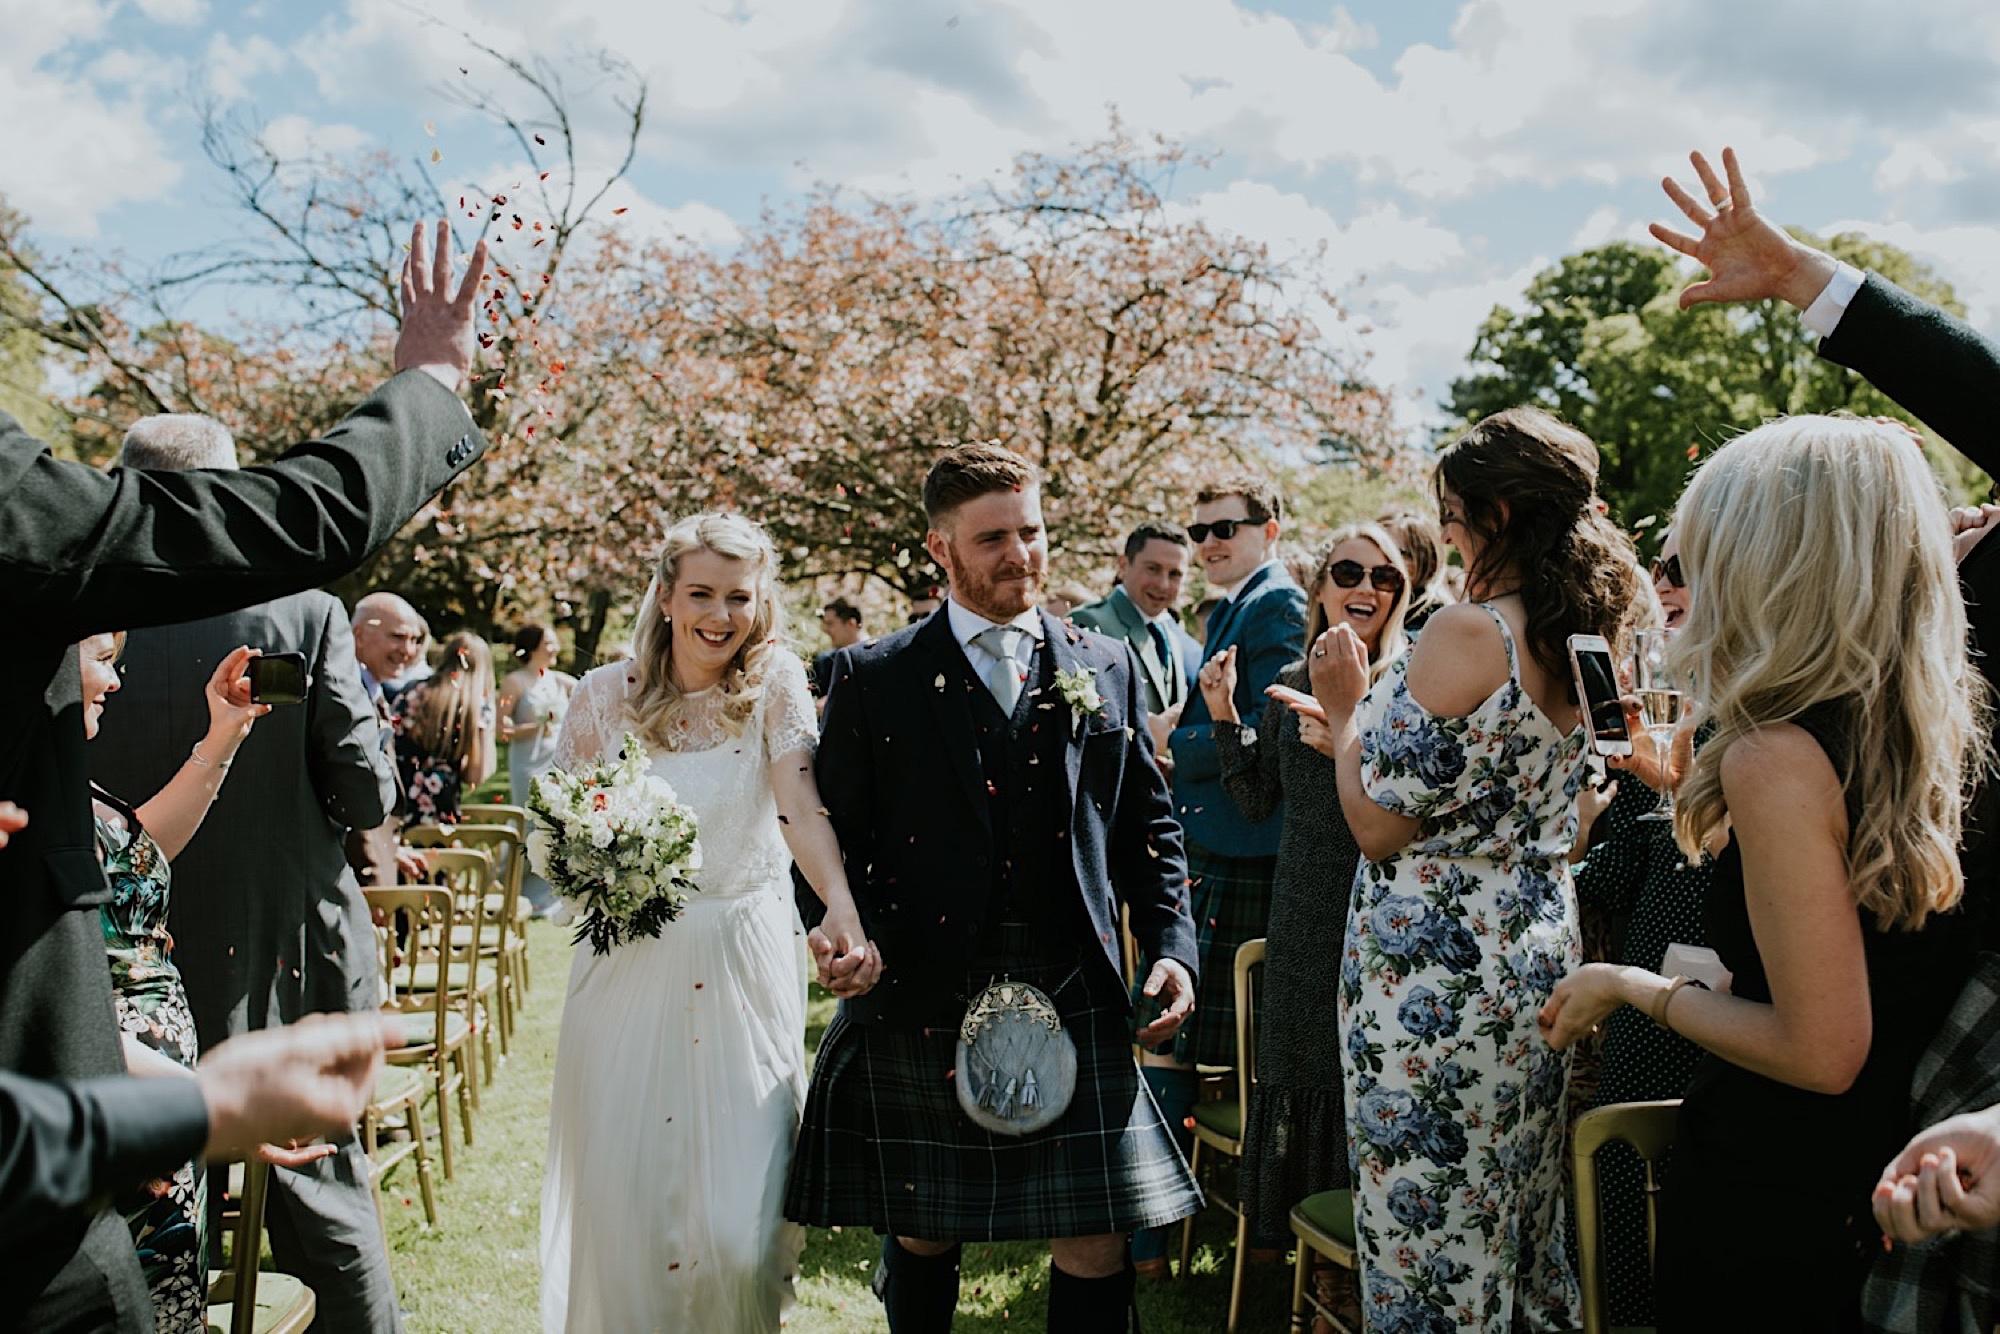 outdoor summer wedding ceremony at kirknewton stables edinburgh rustic barn venue